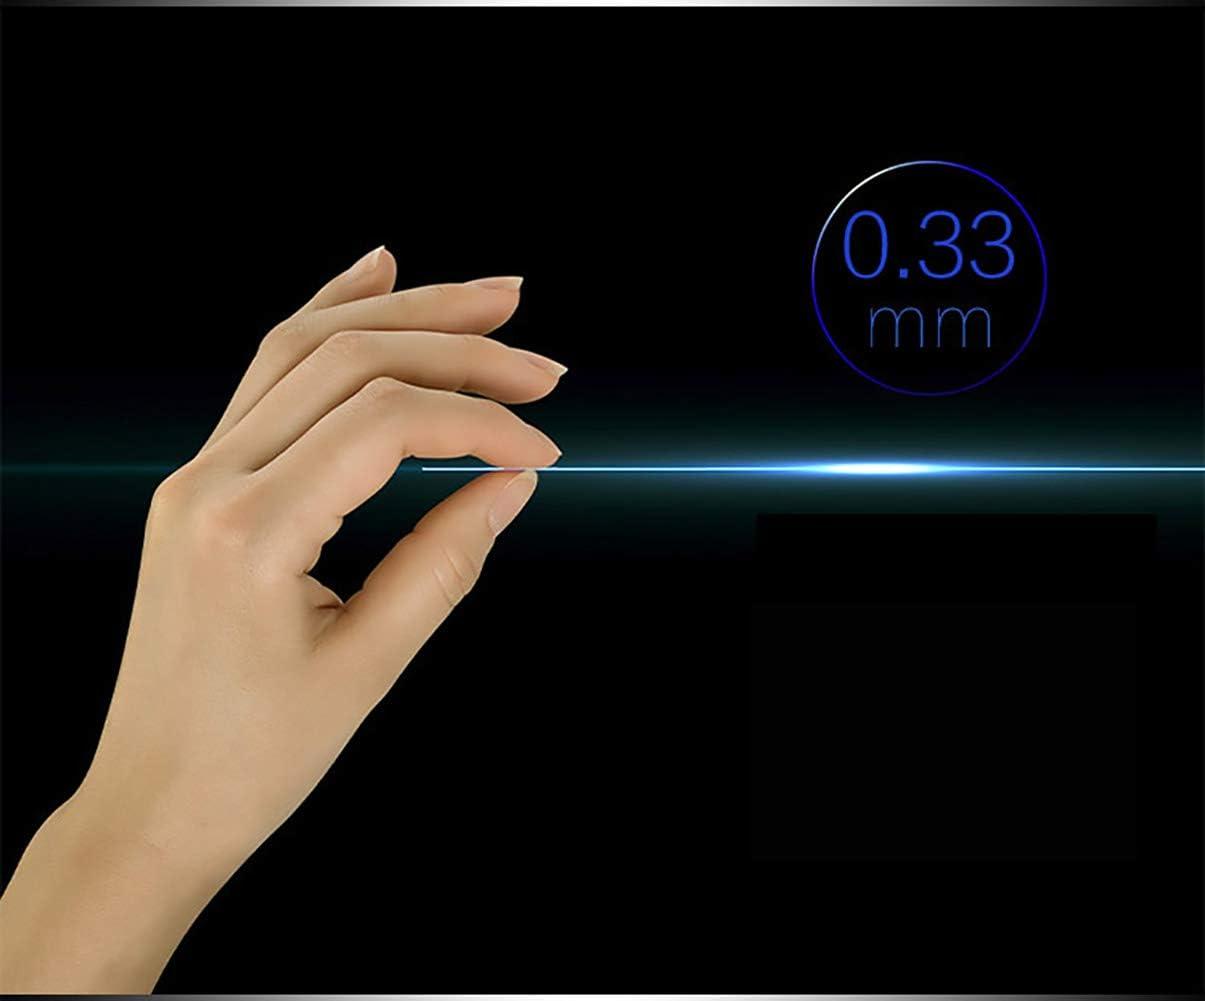 13-2 Tempered Glass Foils for Fuji XA1 XA2 XM1 xt20 xt10 xe3 x-30 Panasonic lx100 Camera